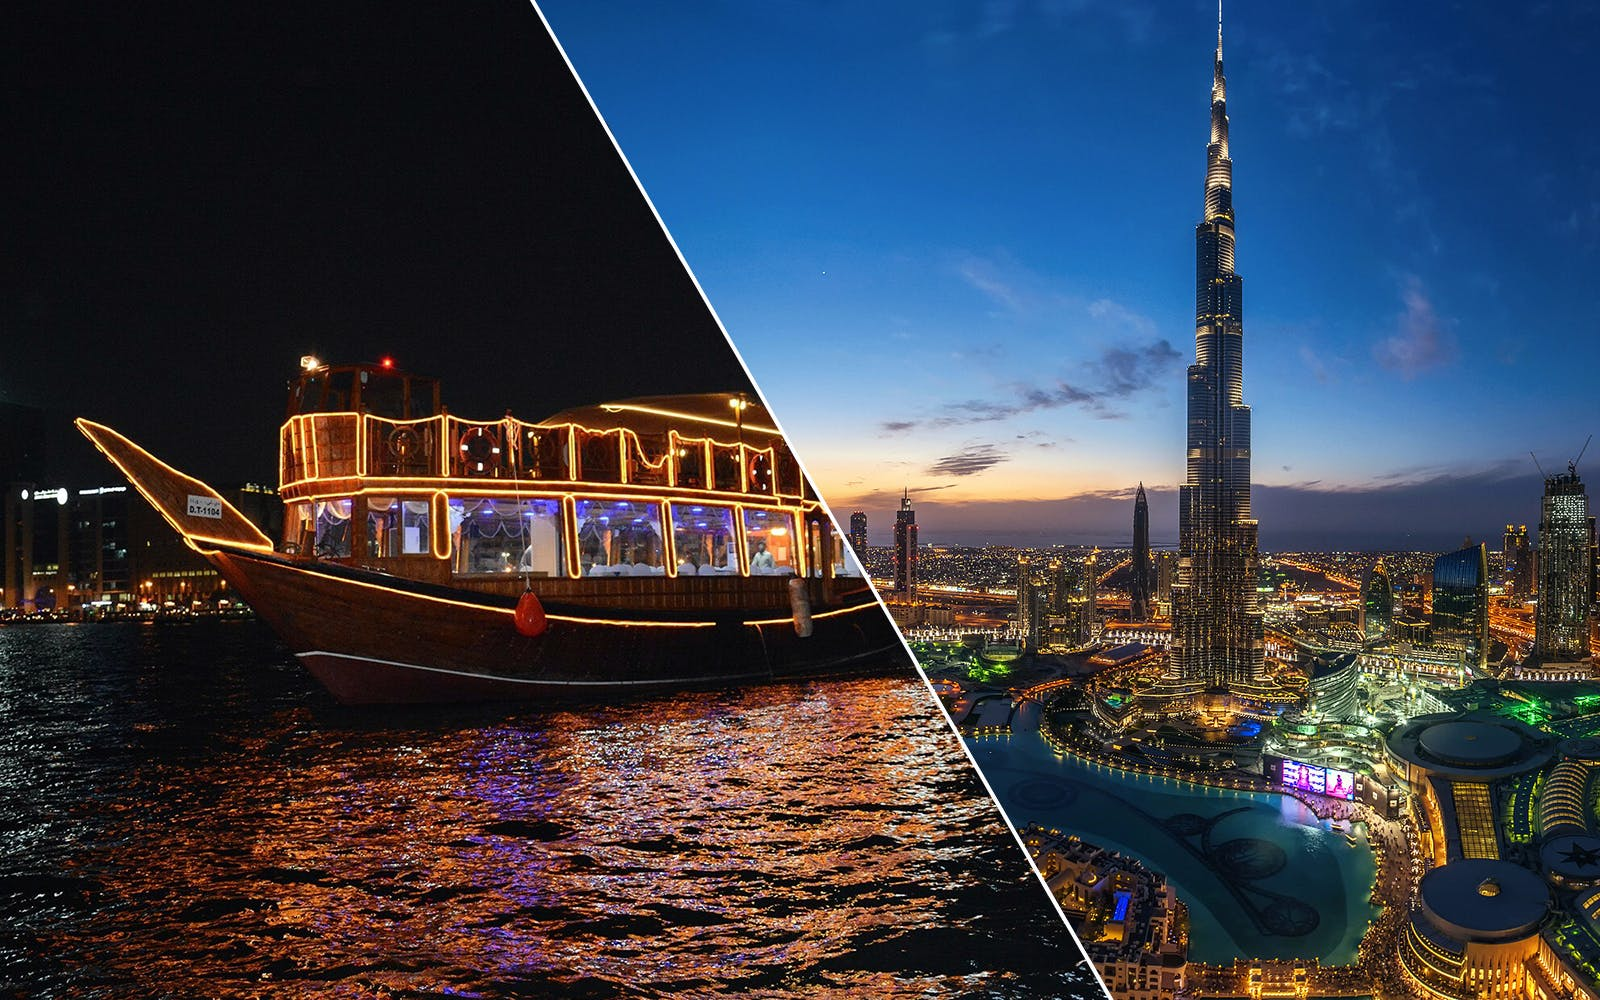 Dubai Dhow Cruise - Burj Khalifa + Dubai Creek cruise